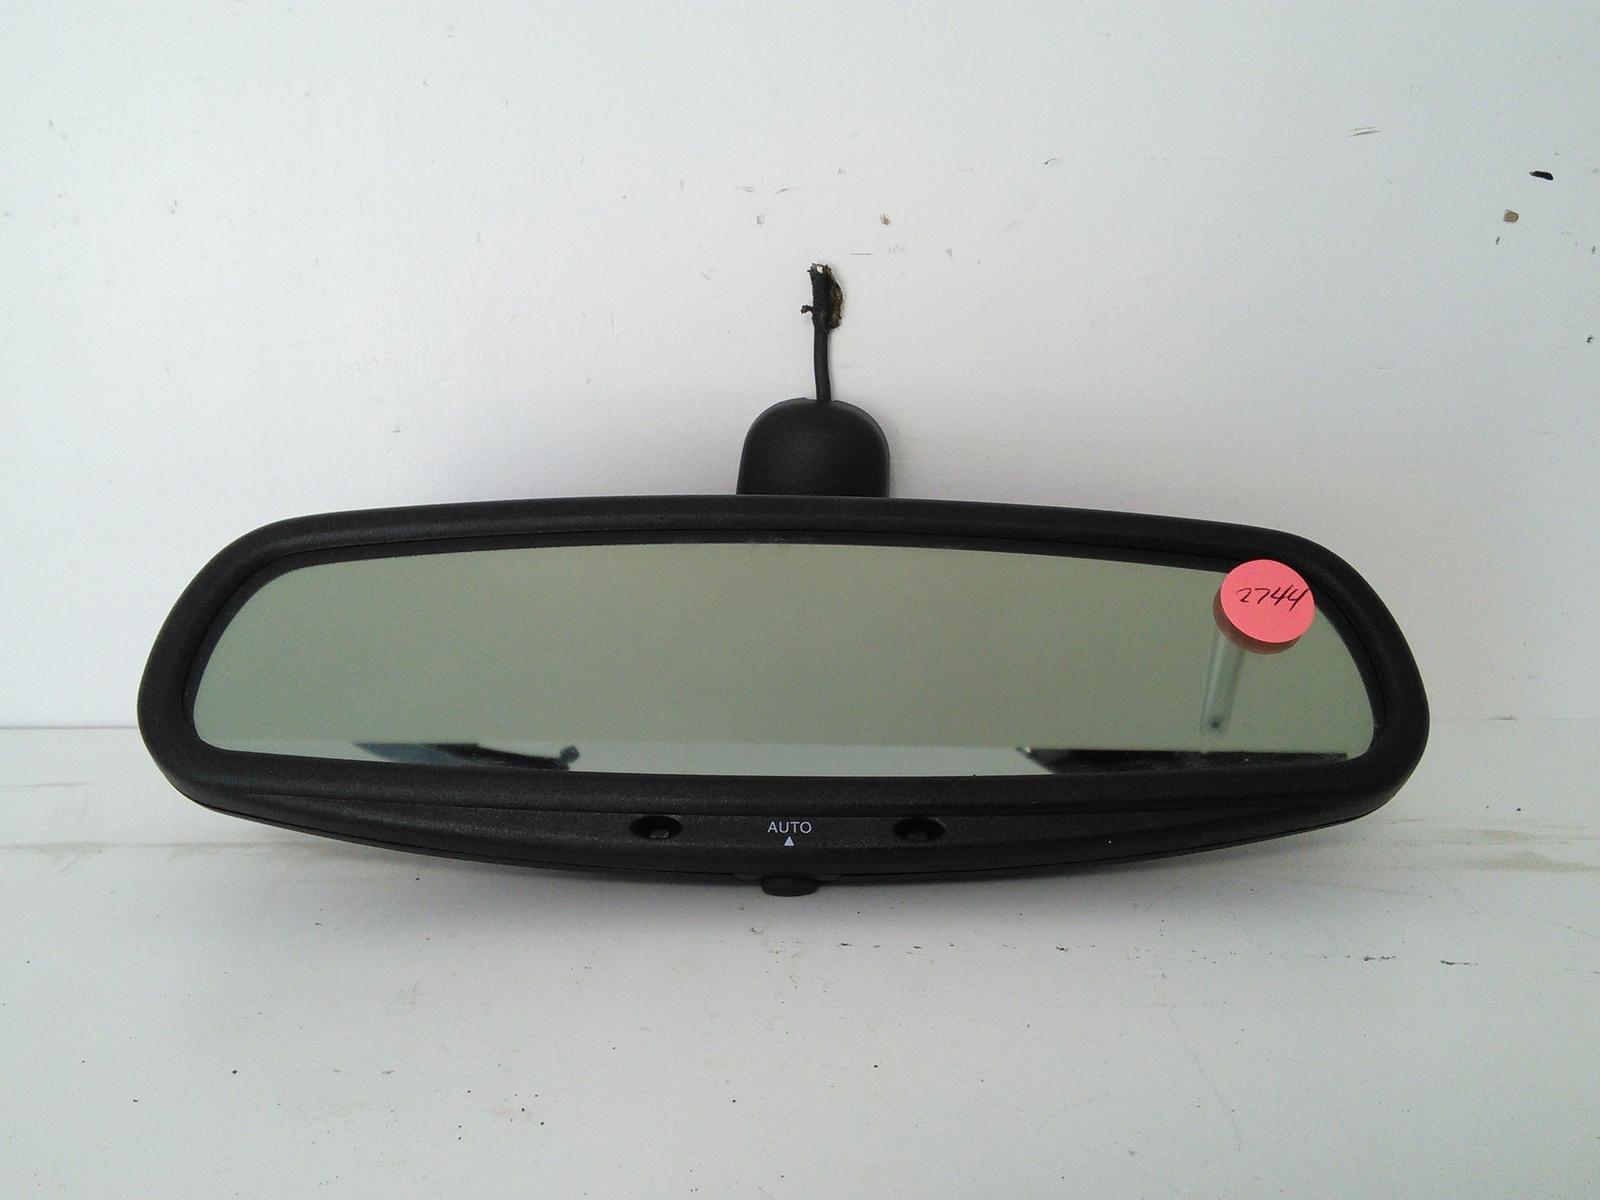 1999 acura tl rear view mirror 1999 2008 acura tl black auto